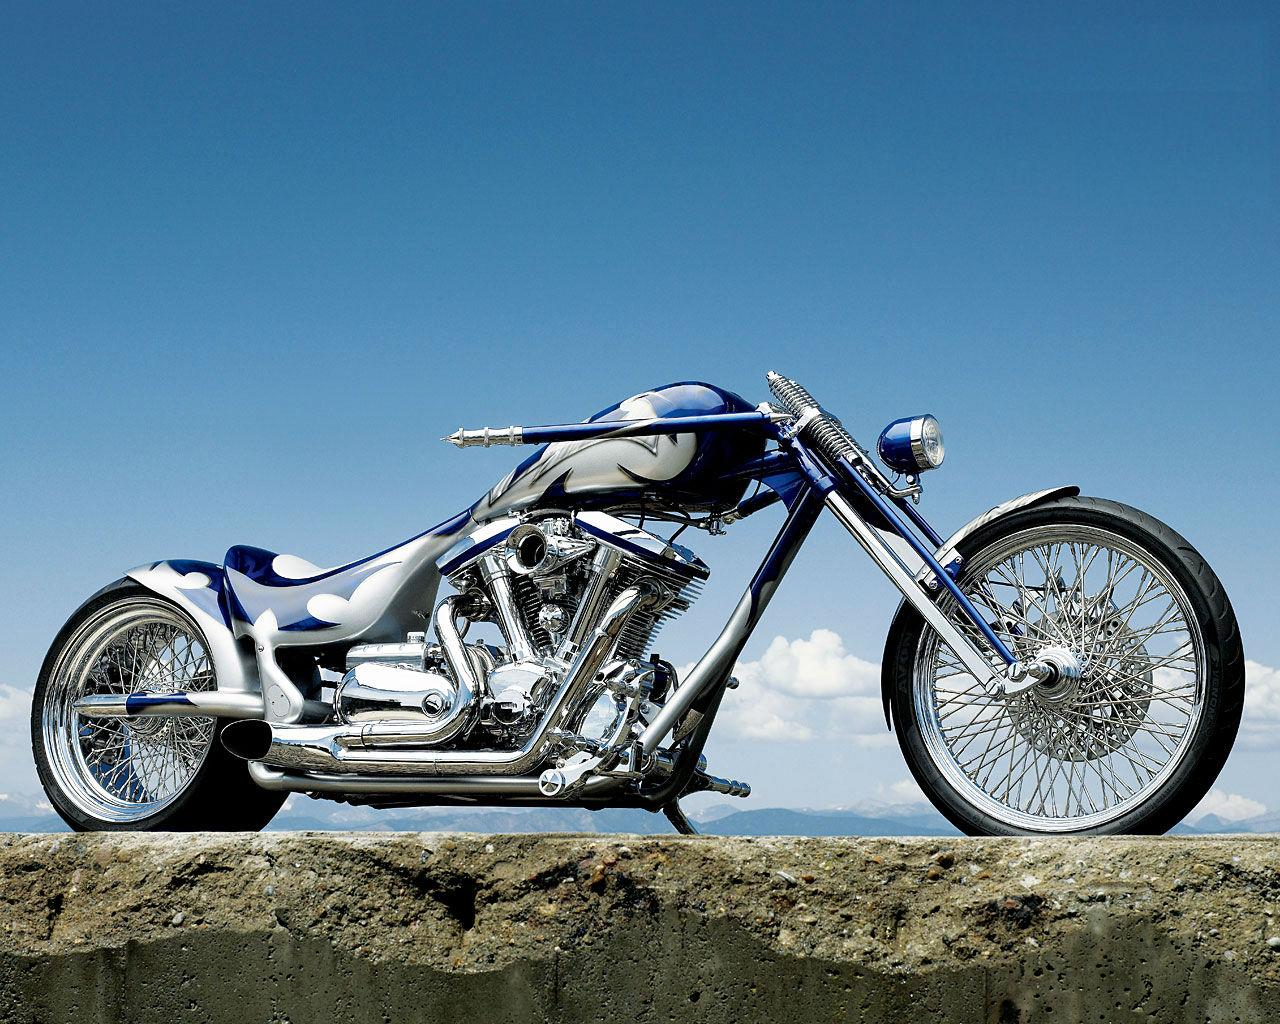 2013 14 Royal Chopper Motorcycle HD Wallpaper   Stylish HD Wallpapers 1280x1024